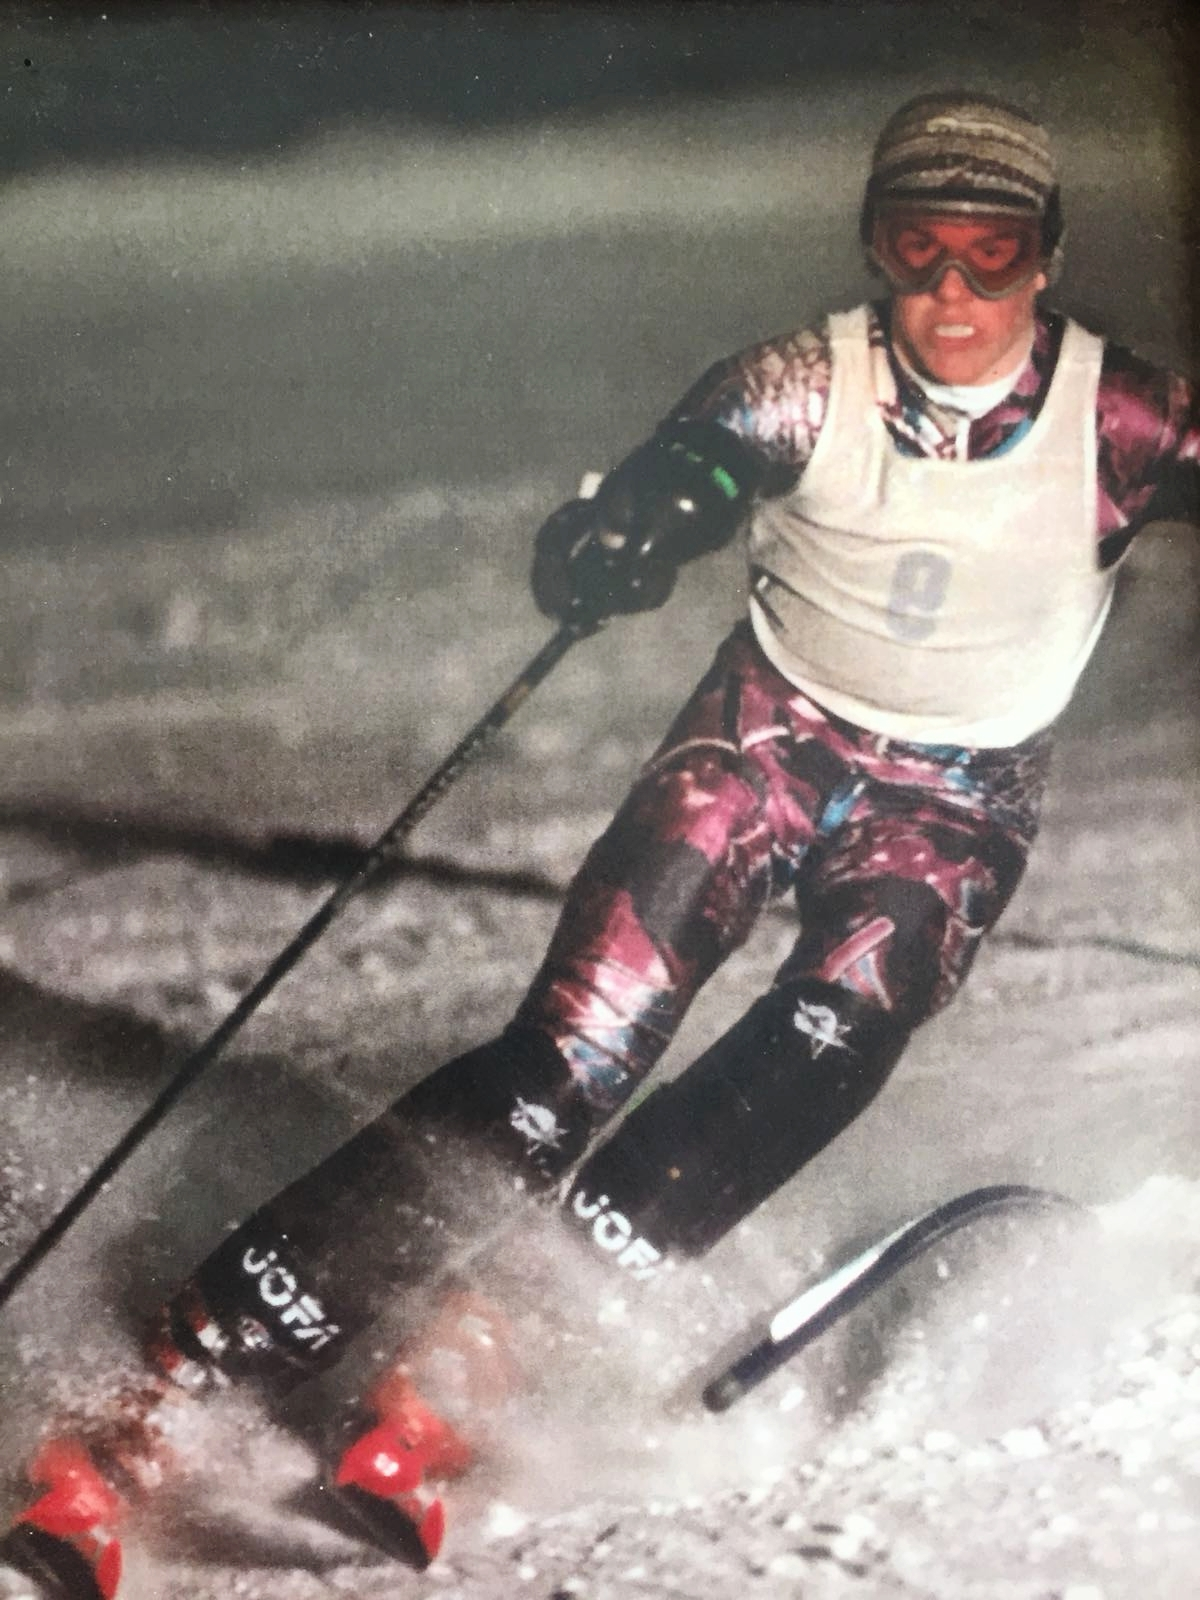 Brent-skiing-1.jpeg